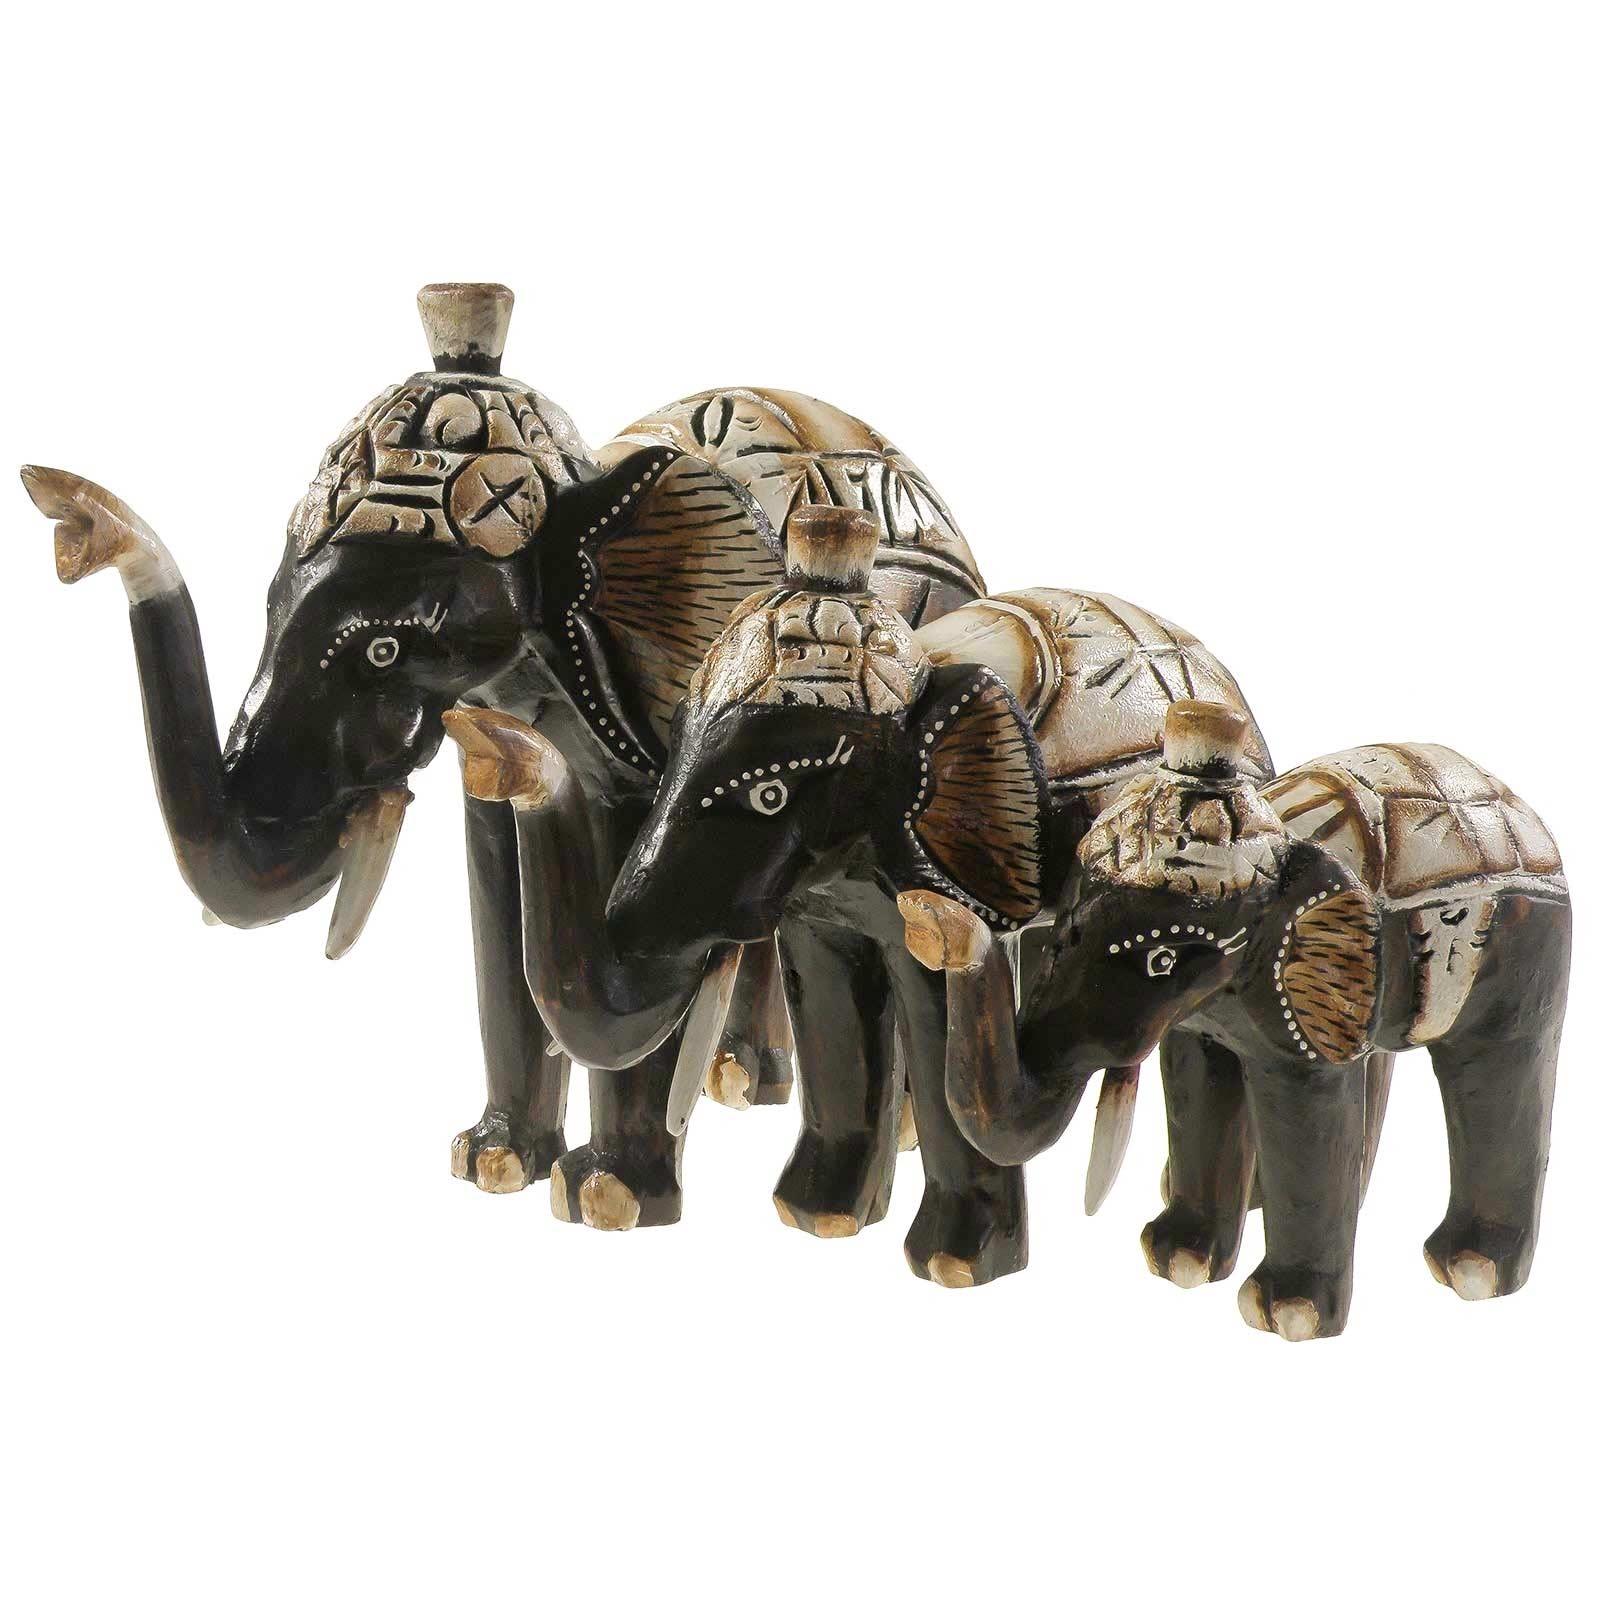 1 Elefant SABI aus Albesia-Holz, Deko-Elefant, ca. 25 cm Holzfigur – Bild 1